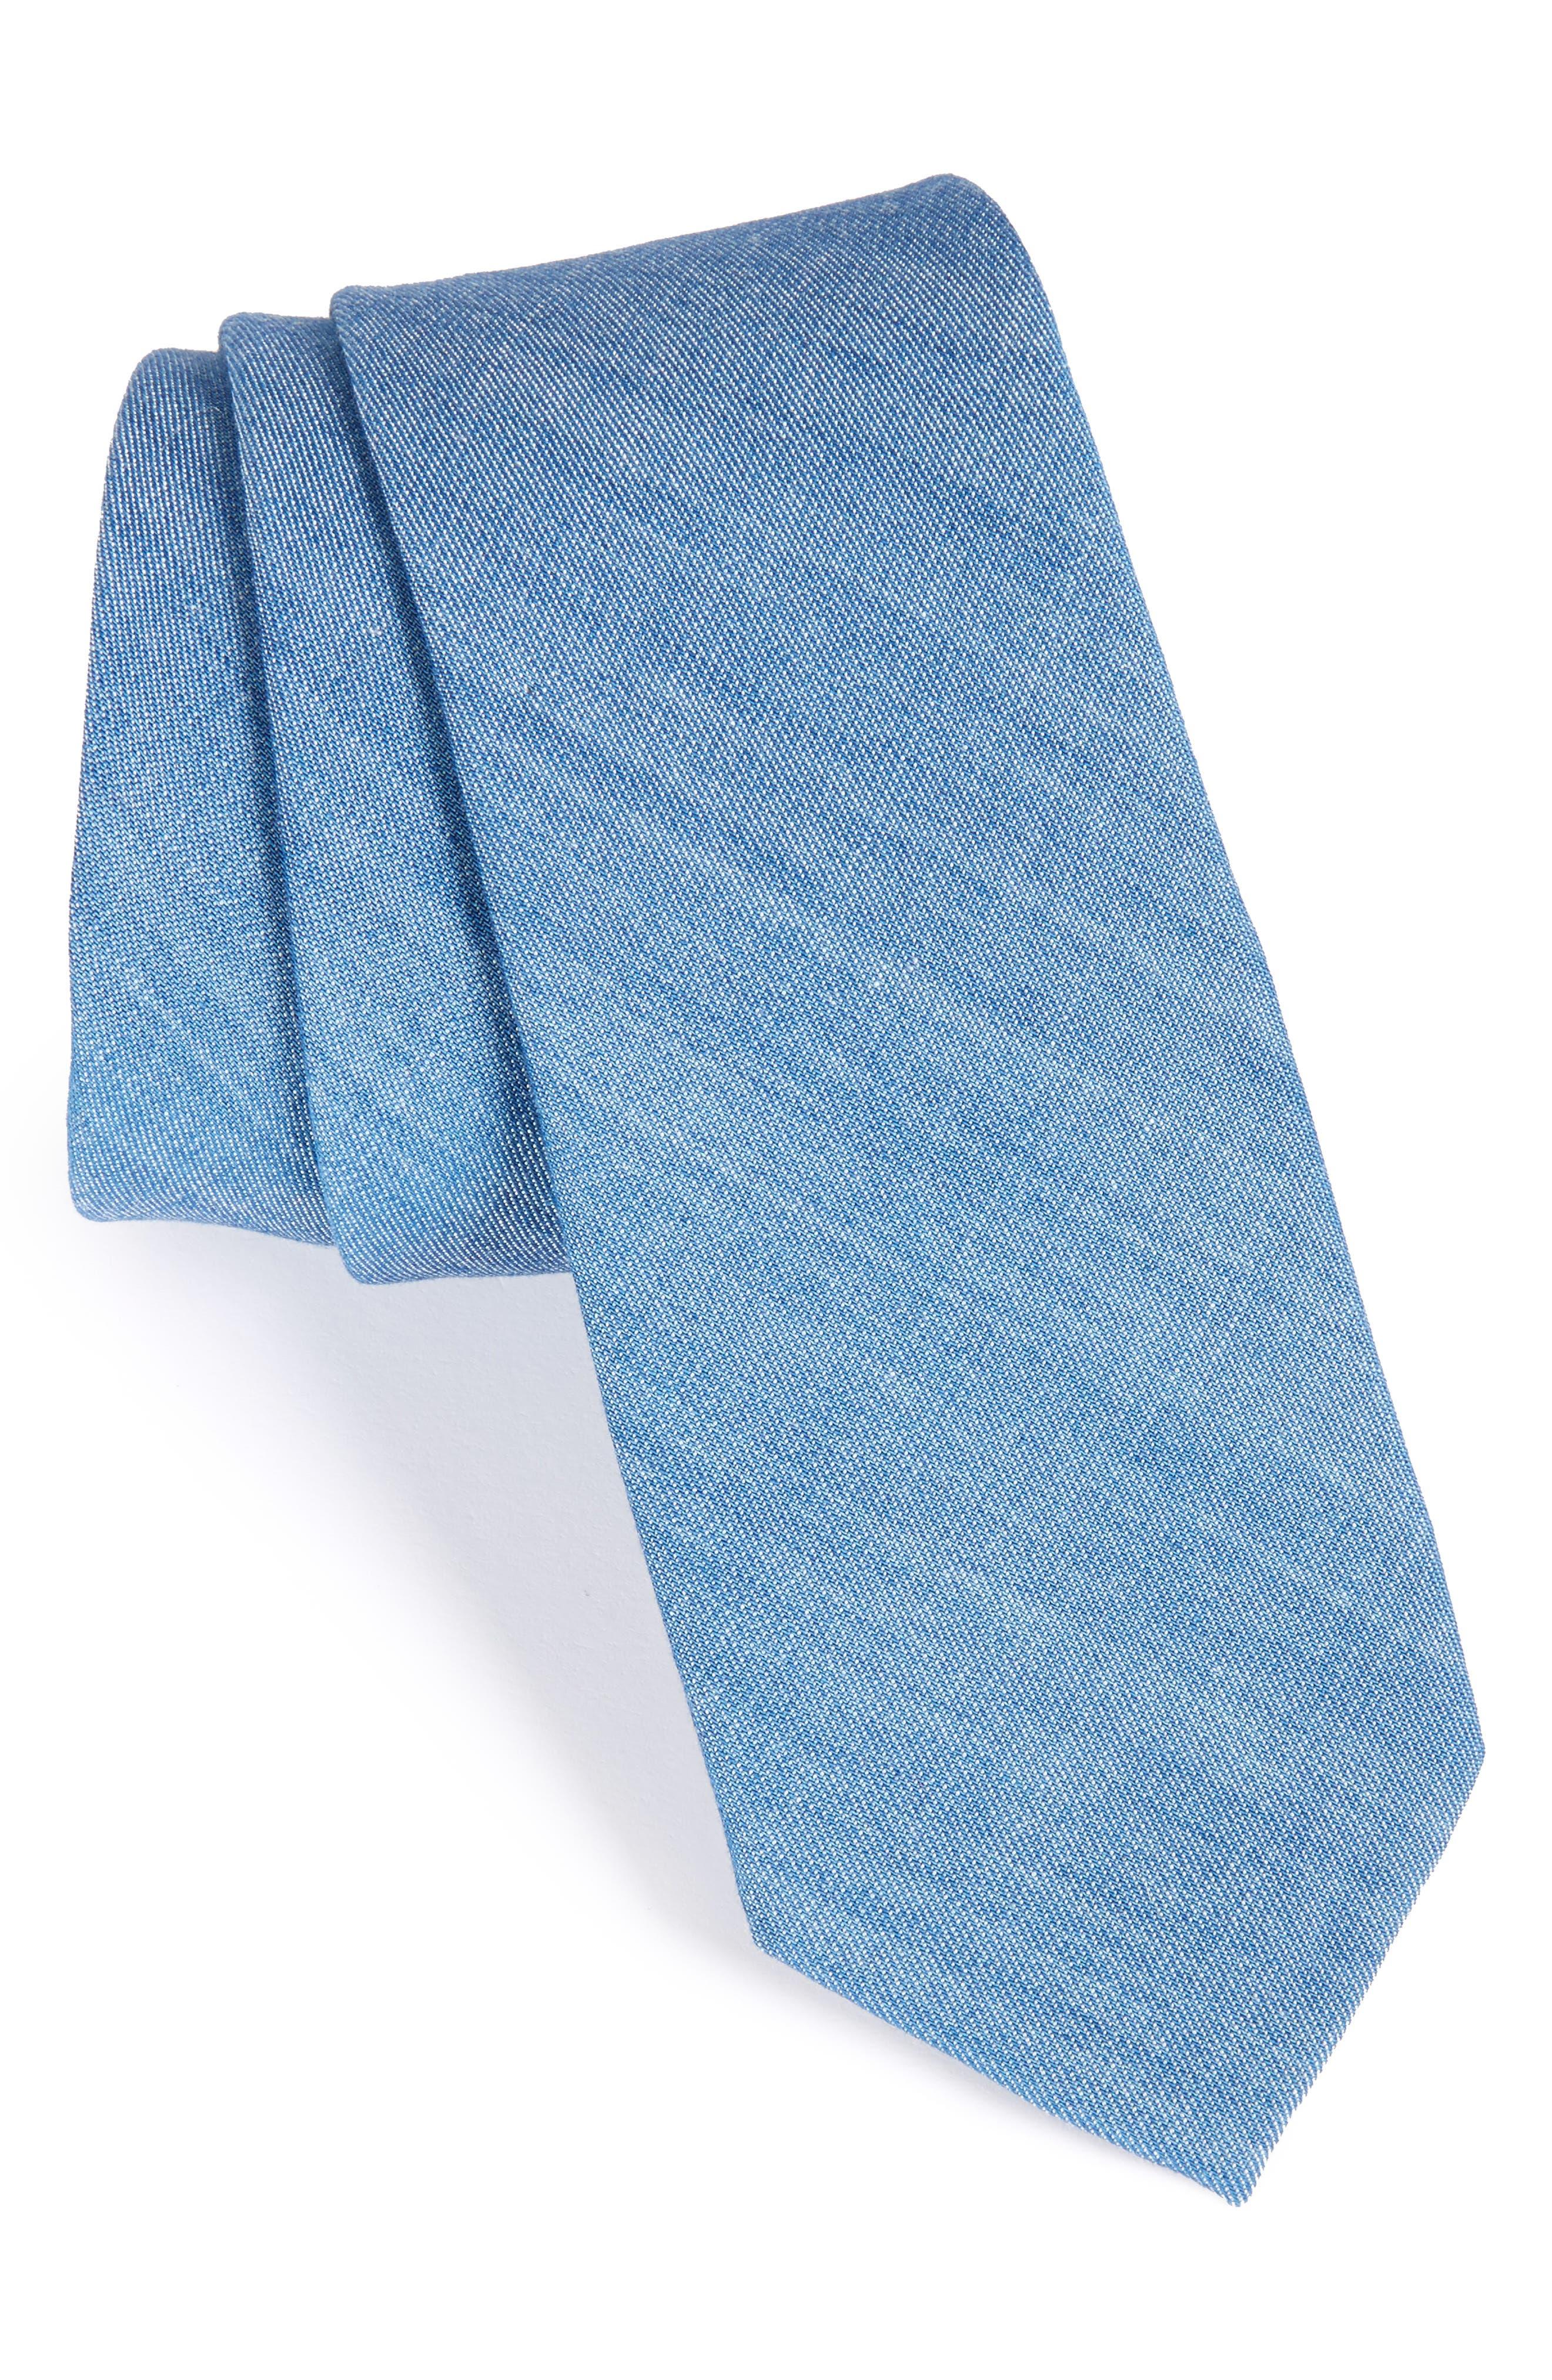 Solid Cotton Blend Skinny Tie,                         Main,                         color, Blue